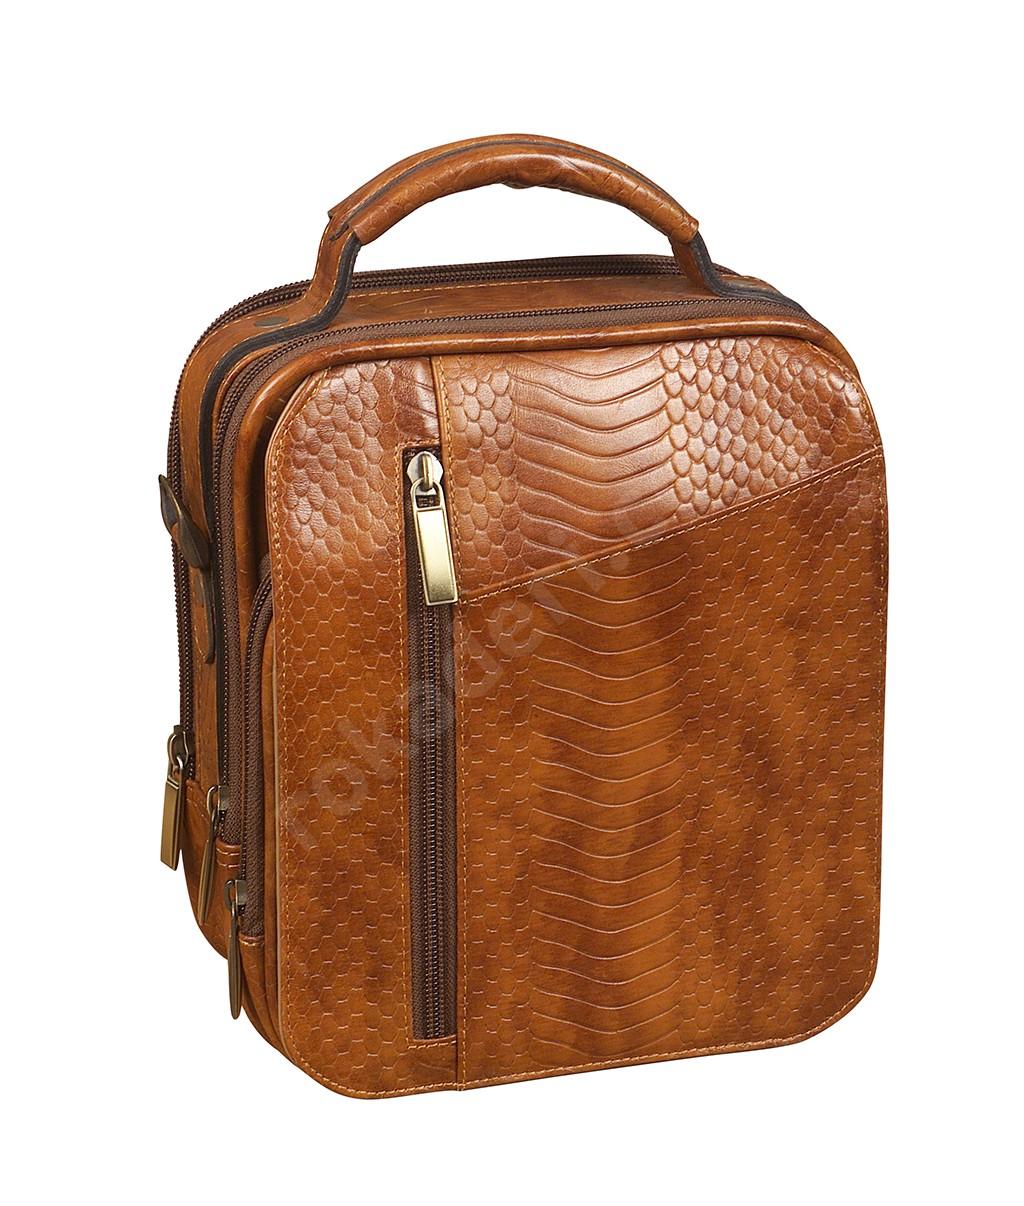 taba portföy çanta